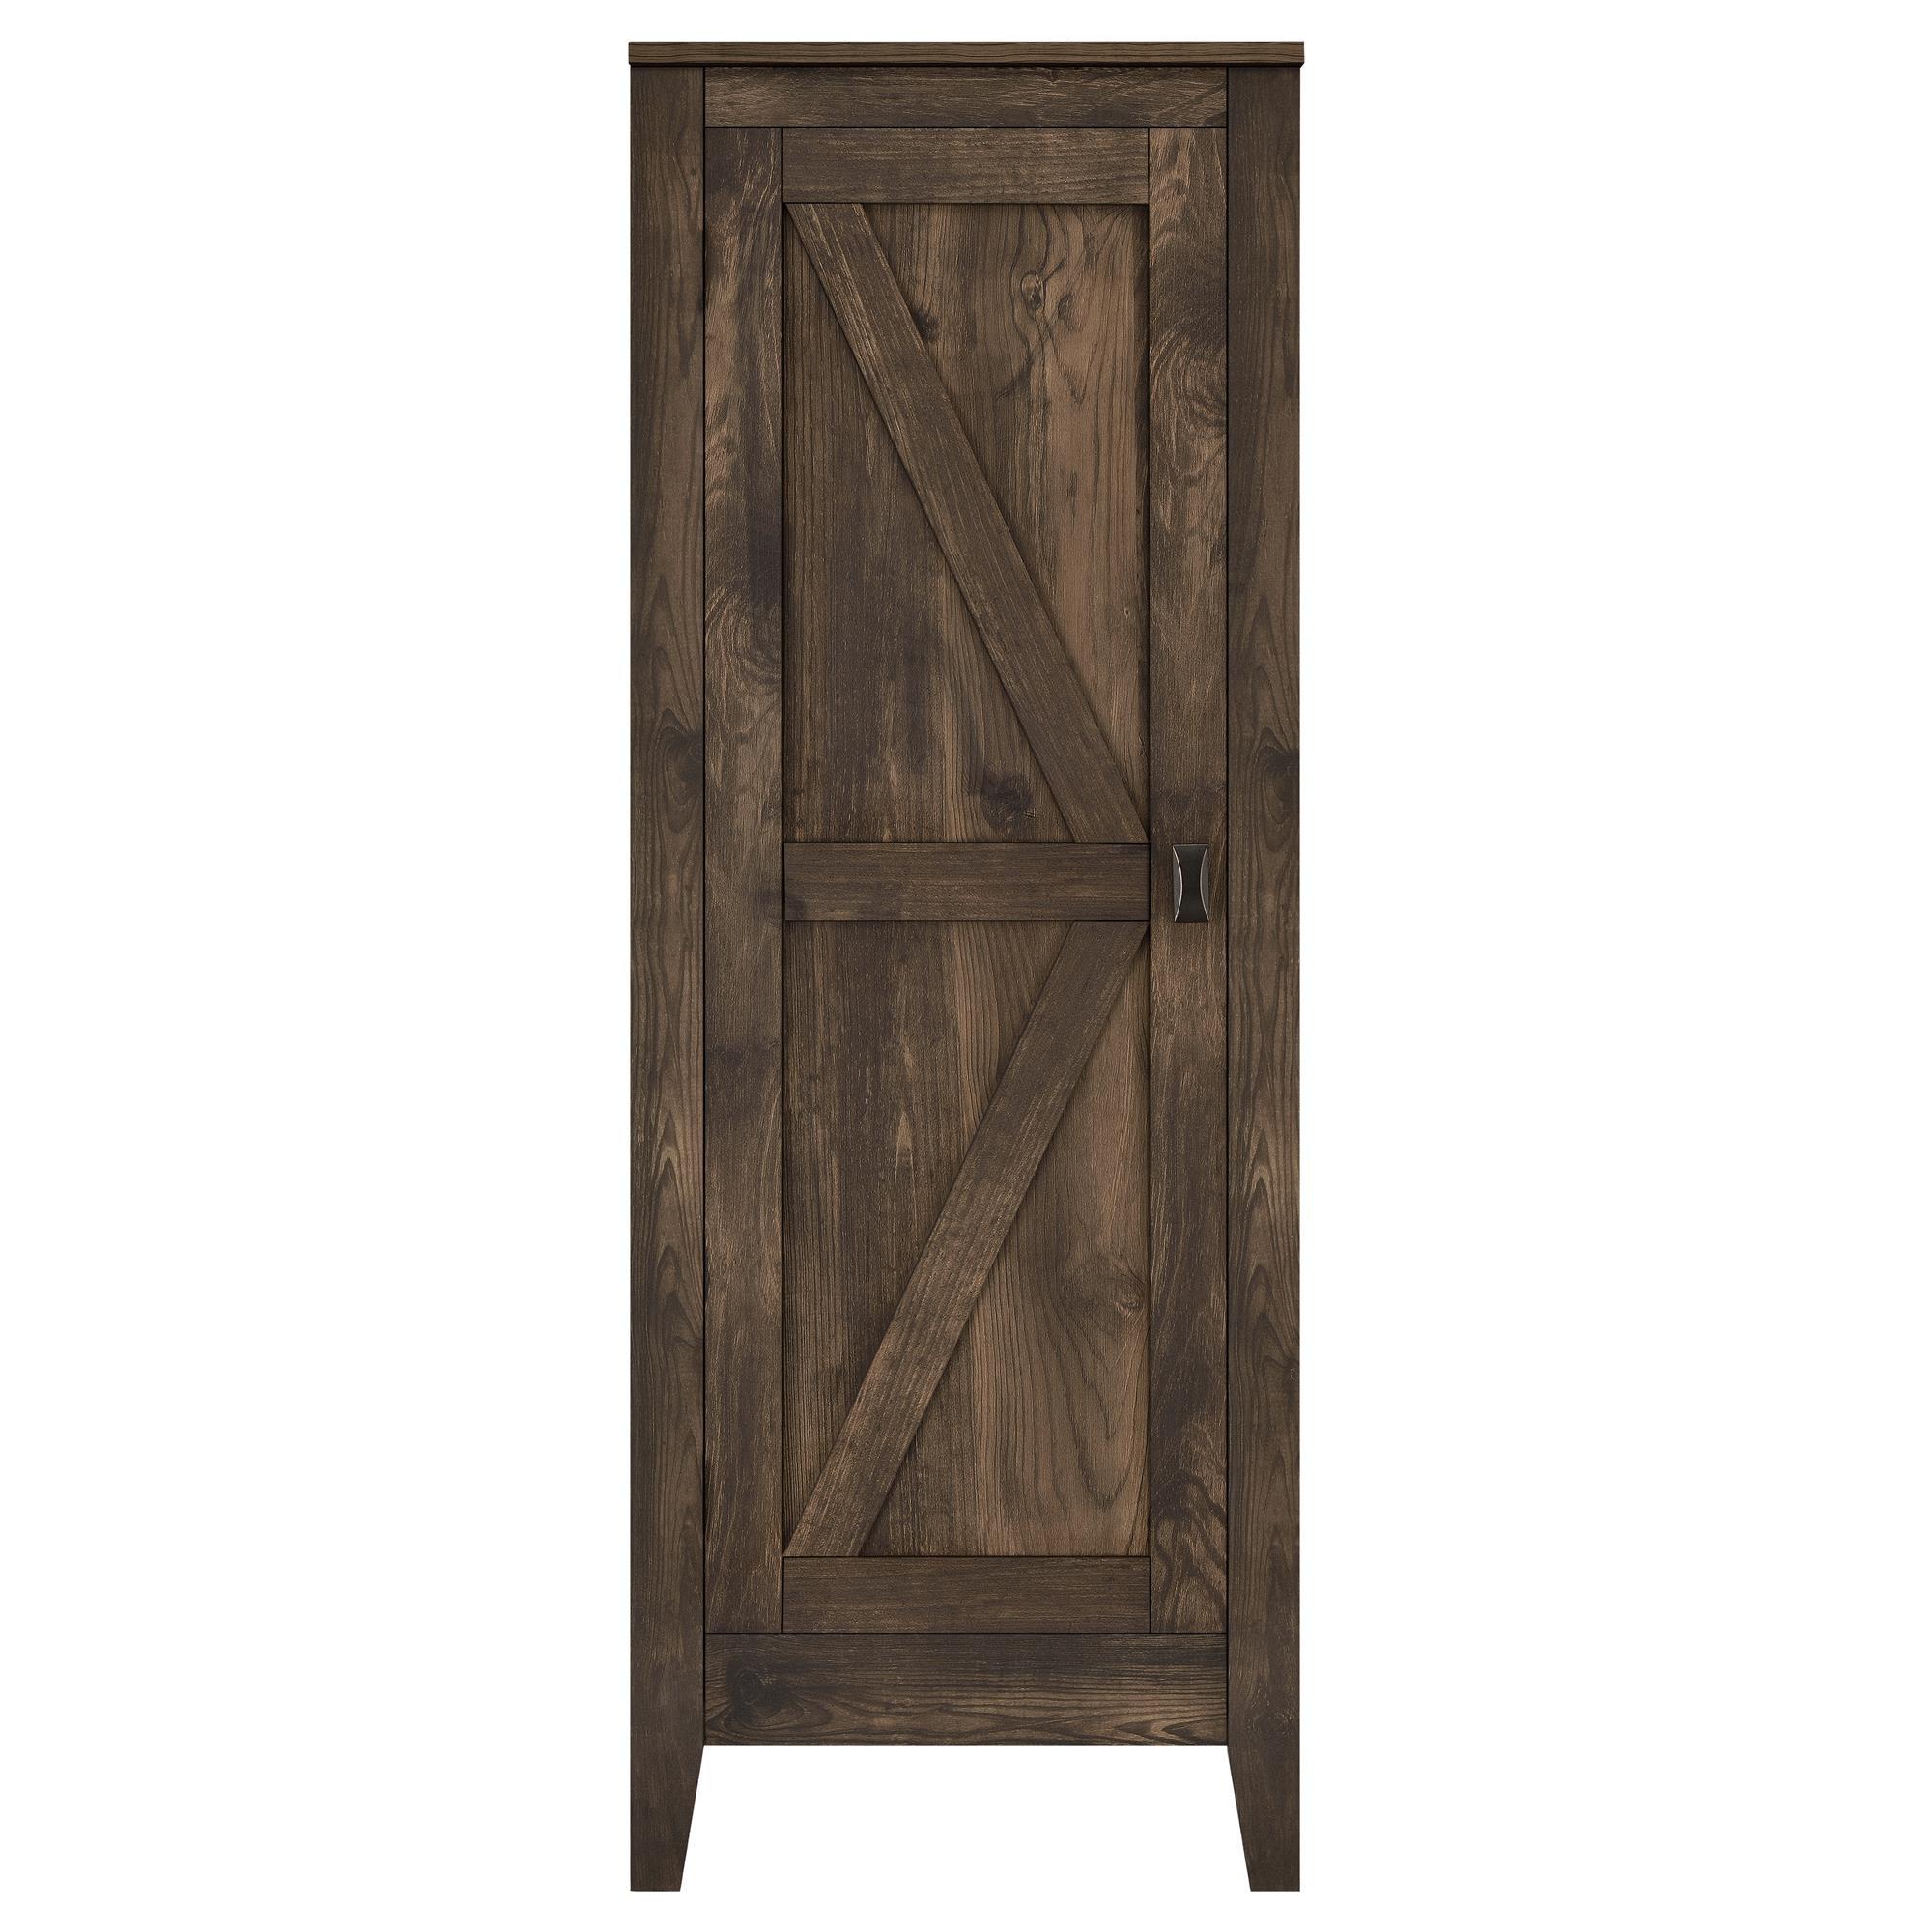 Laurel Foundry Modern Farmhouse Berenice 1 Door Accent Cabinet Reviews Wayfair